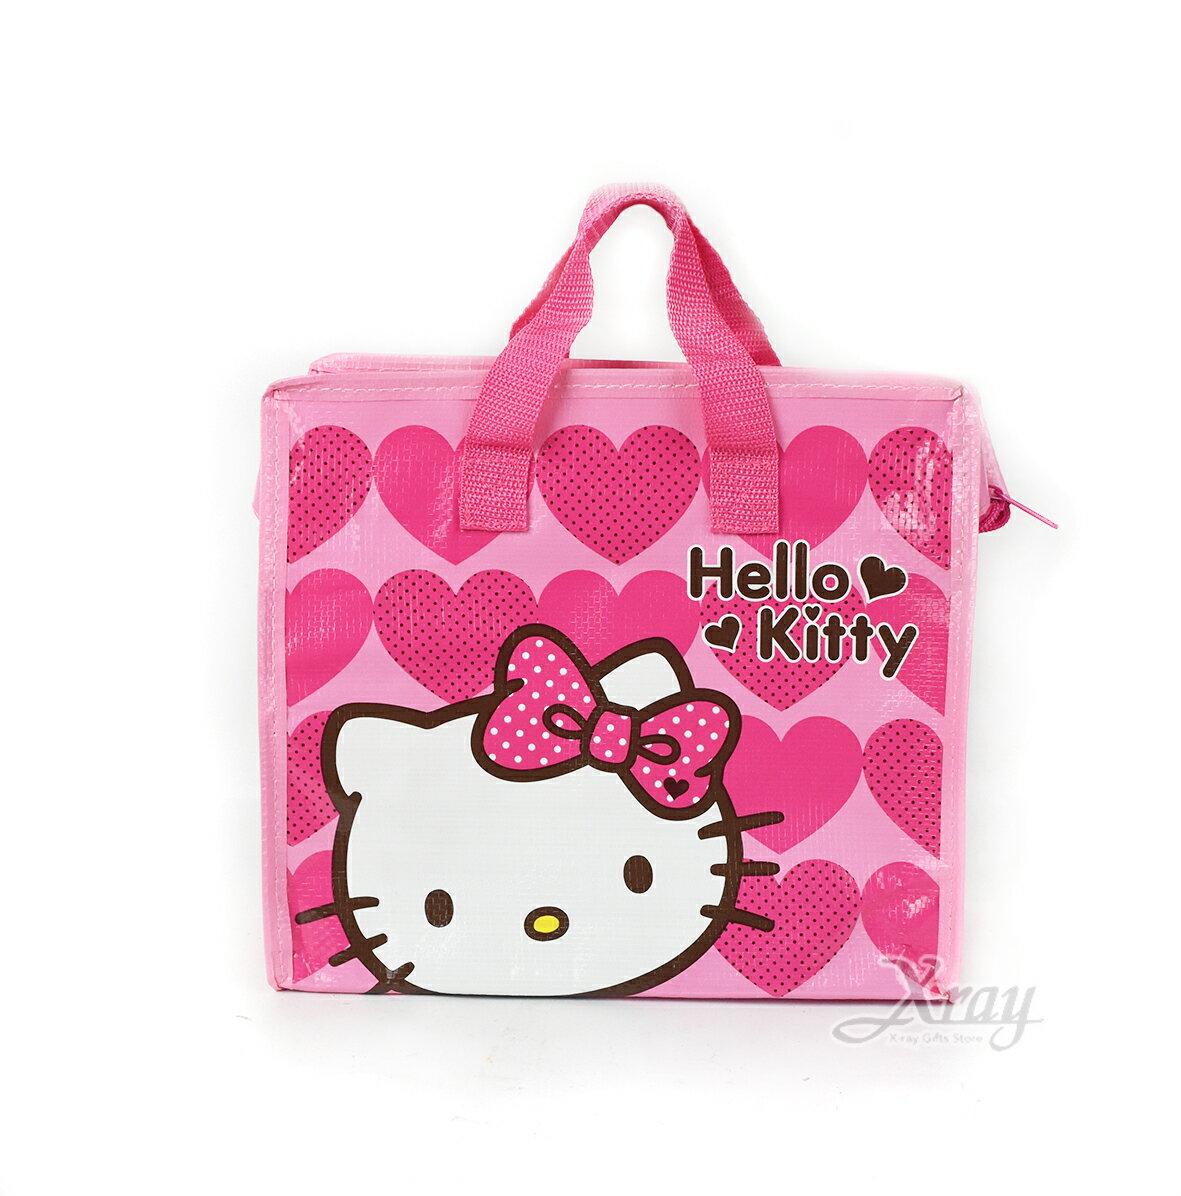 X射線【C168095】Hello Kitty 購物收納袋BAG-小,書袋/購物袋/便當袋/手提袋/筆袋/面紙包/化妝包/零錢包/收納包